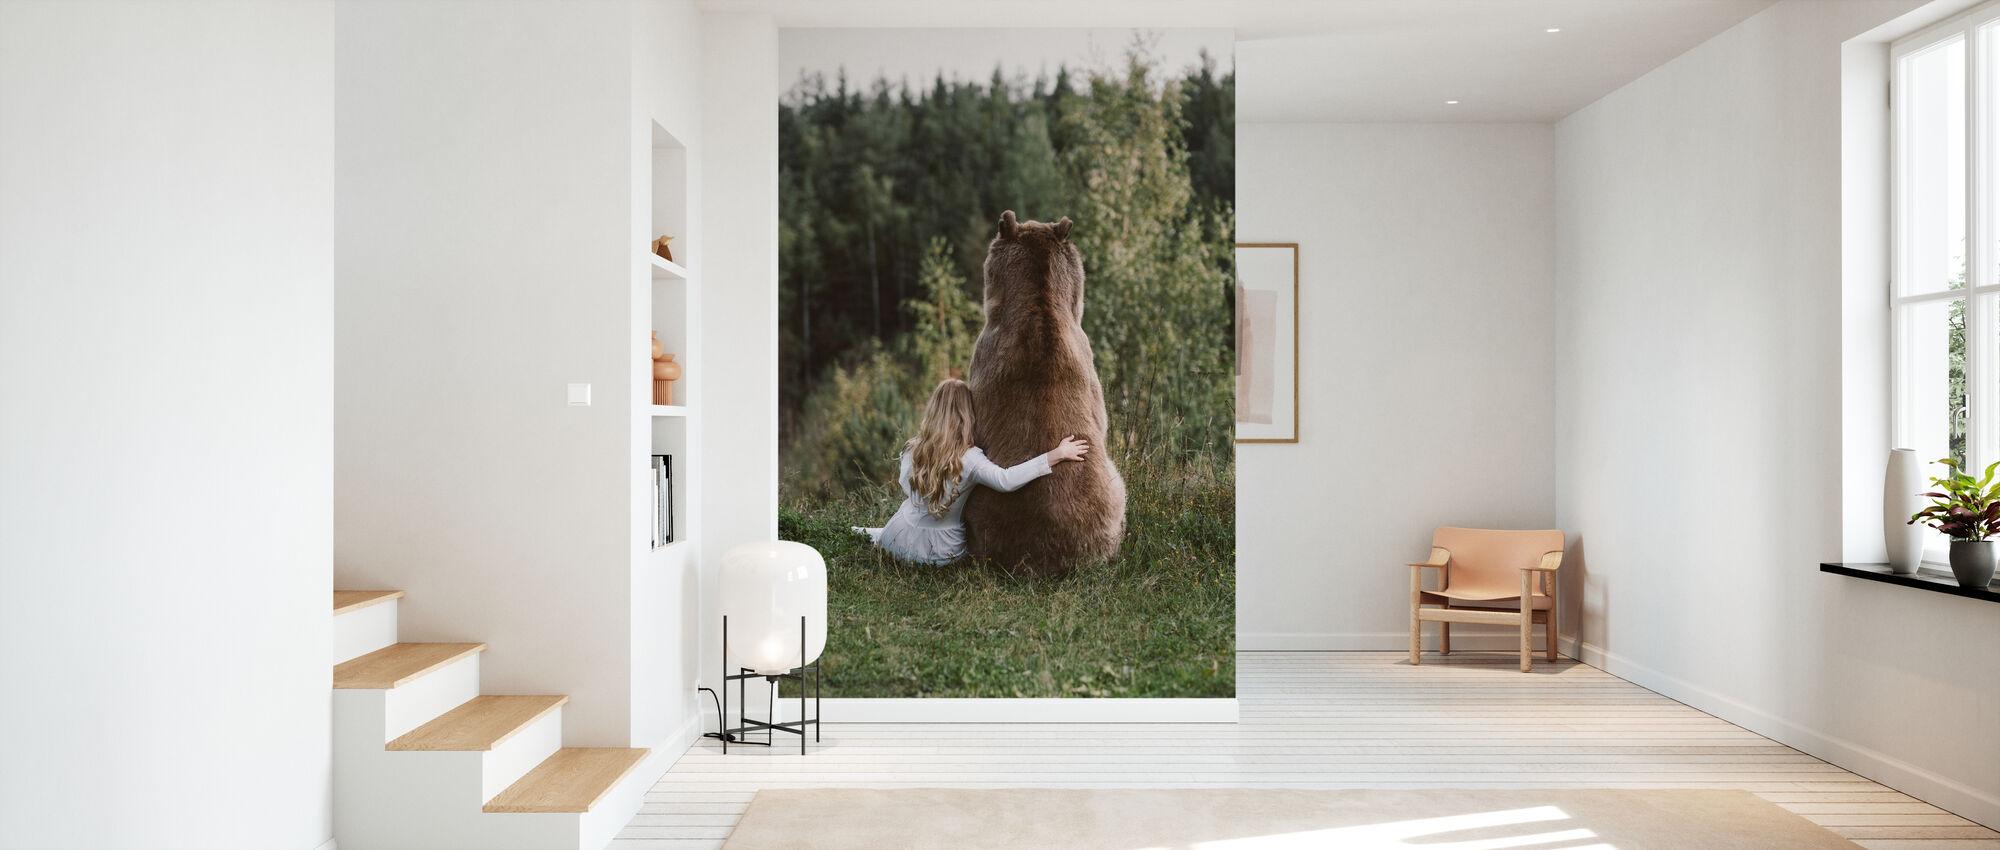 Bear Hug - Wallpaper - Hallway